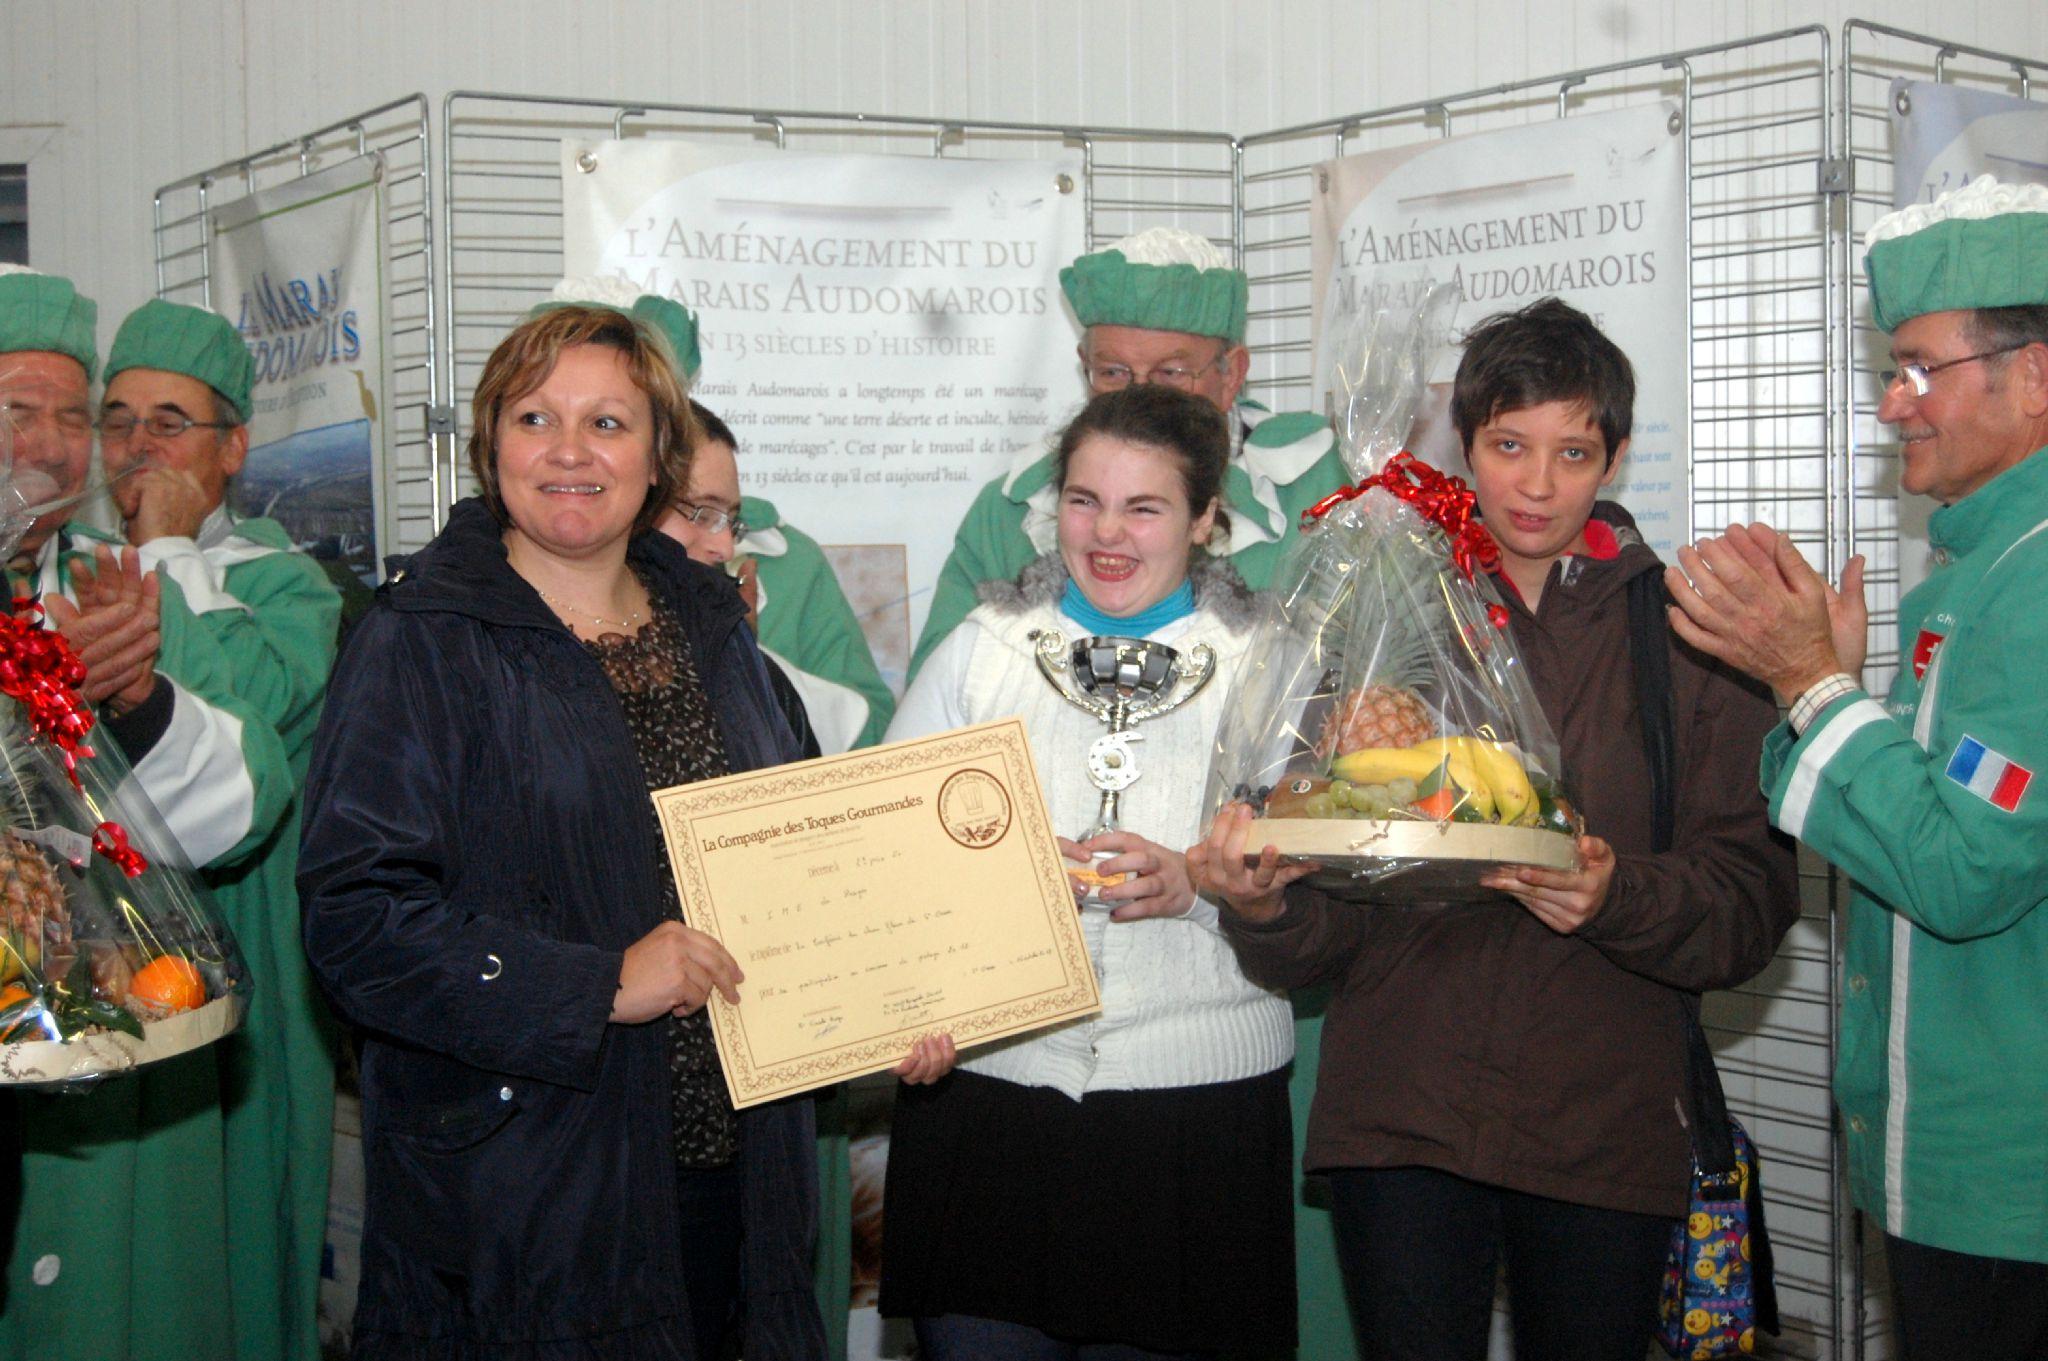 mardi 16 oct 2012 remise des prix et inauguration (33)